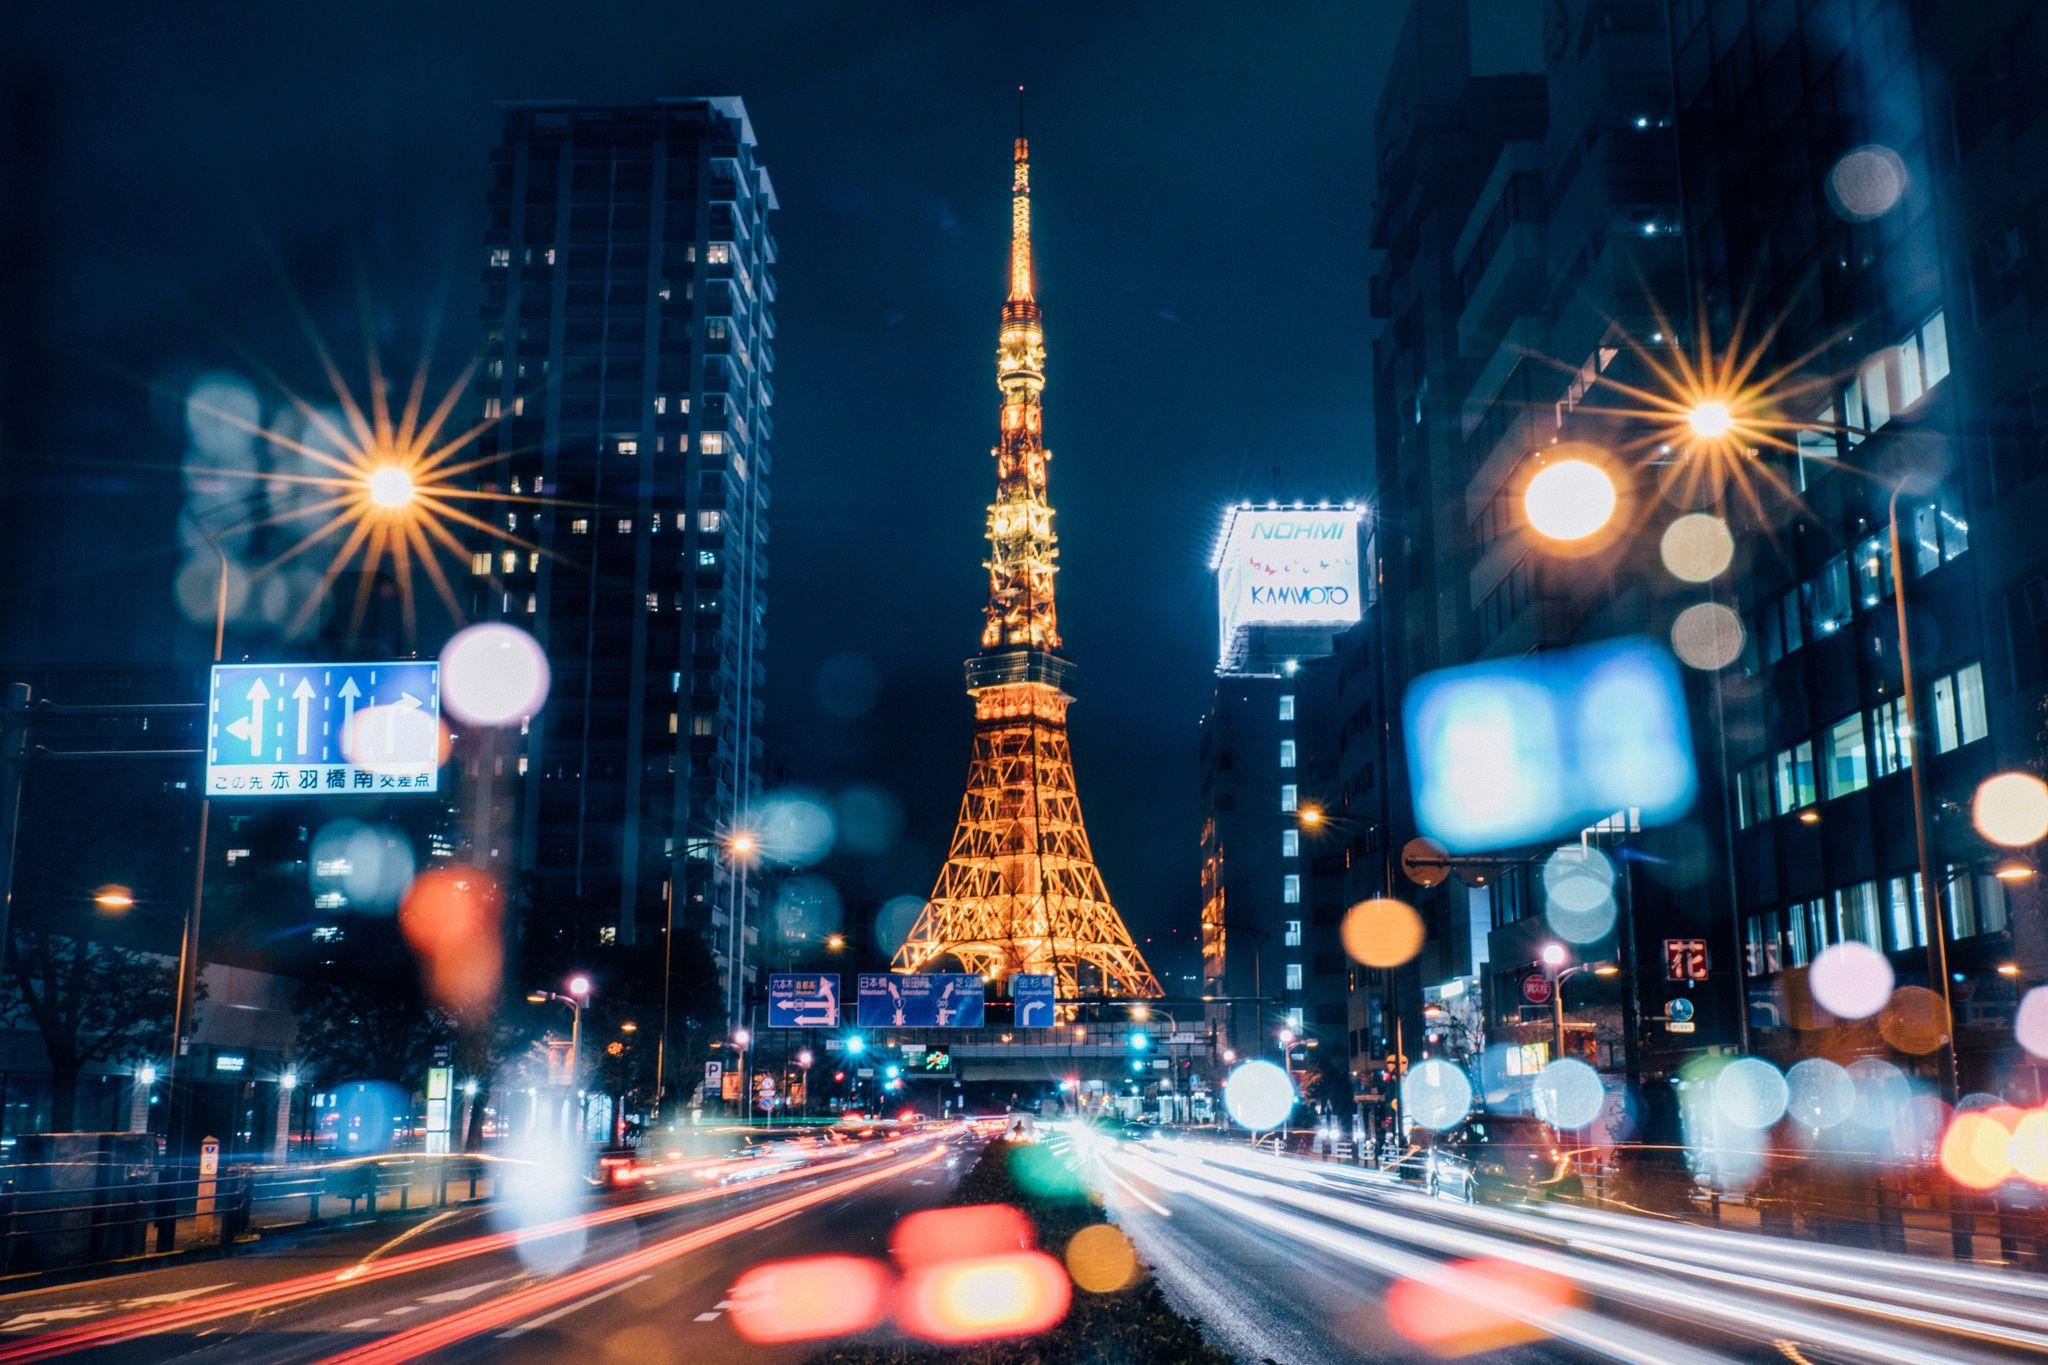 Tokyo Night Wallpapers Full Hd Tokyo night, Tokyo